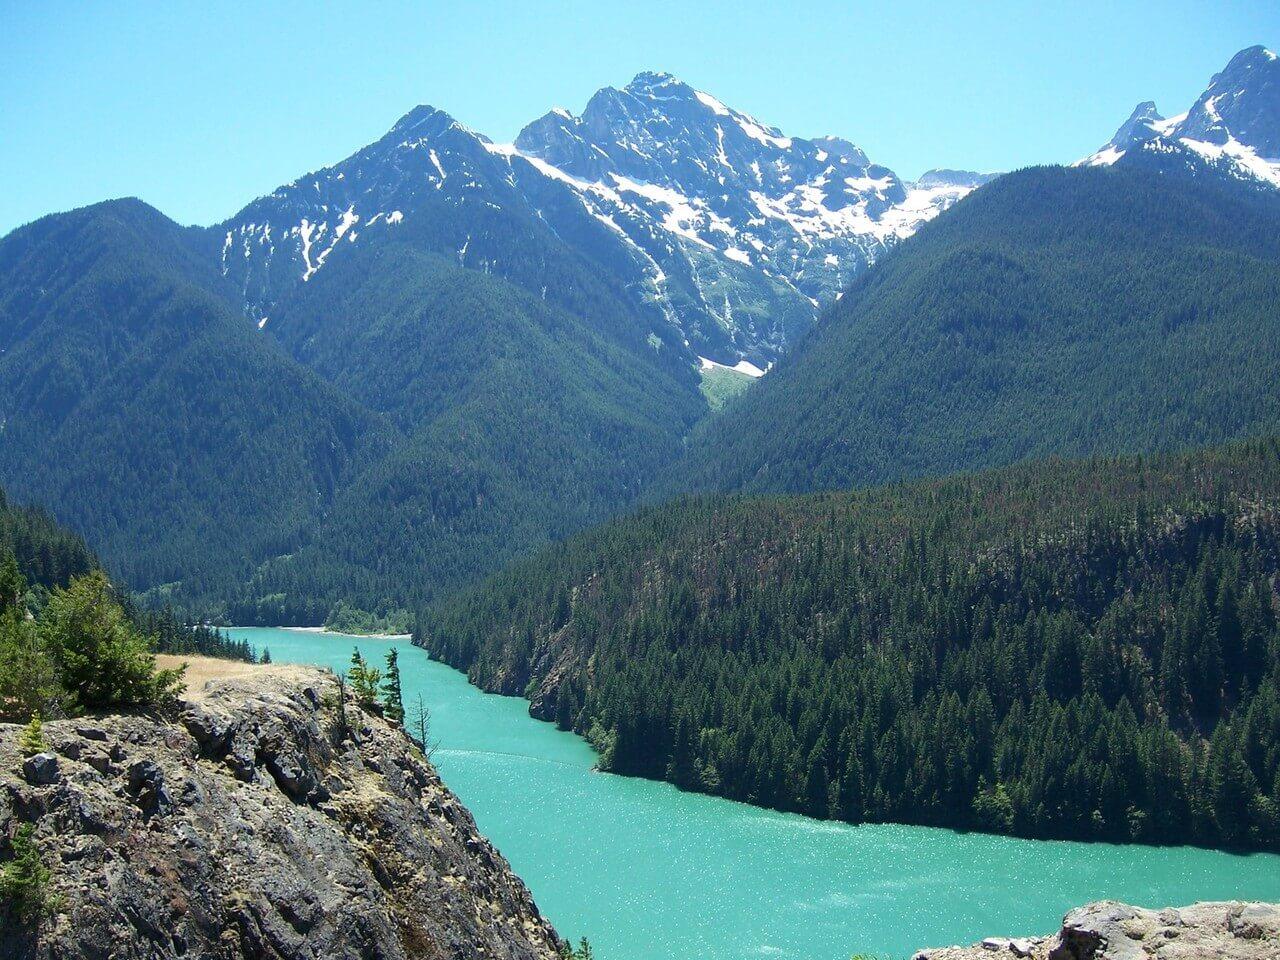 Skagit River